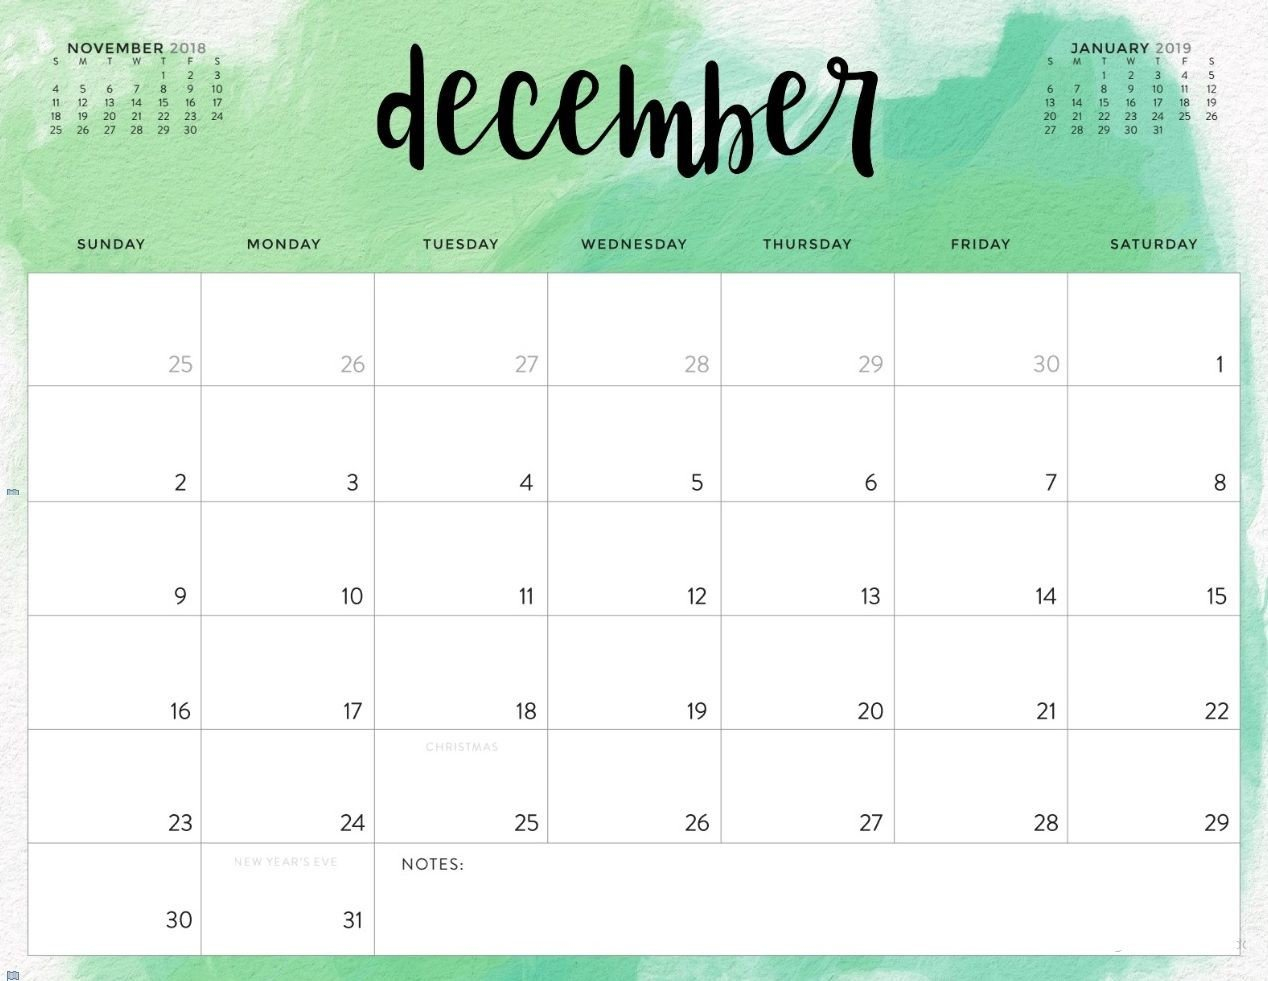 Custom Calendar For Business – Marry Steven – Medium Calendar That You Can Edit